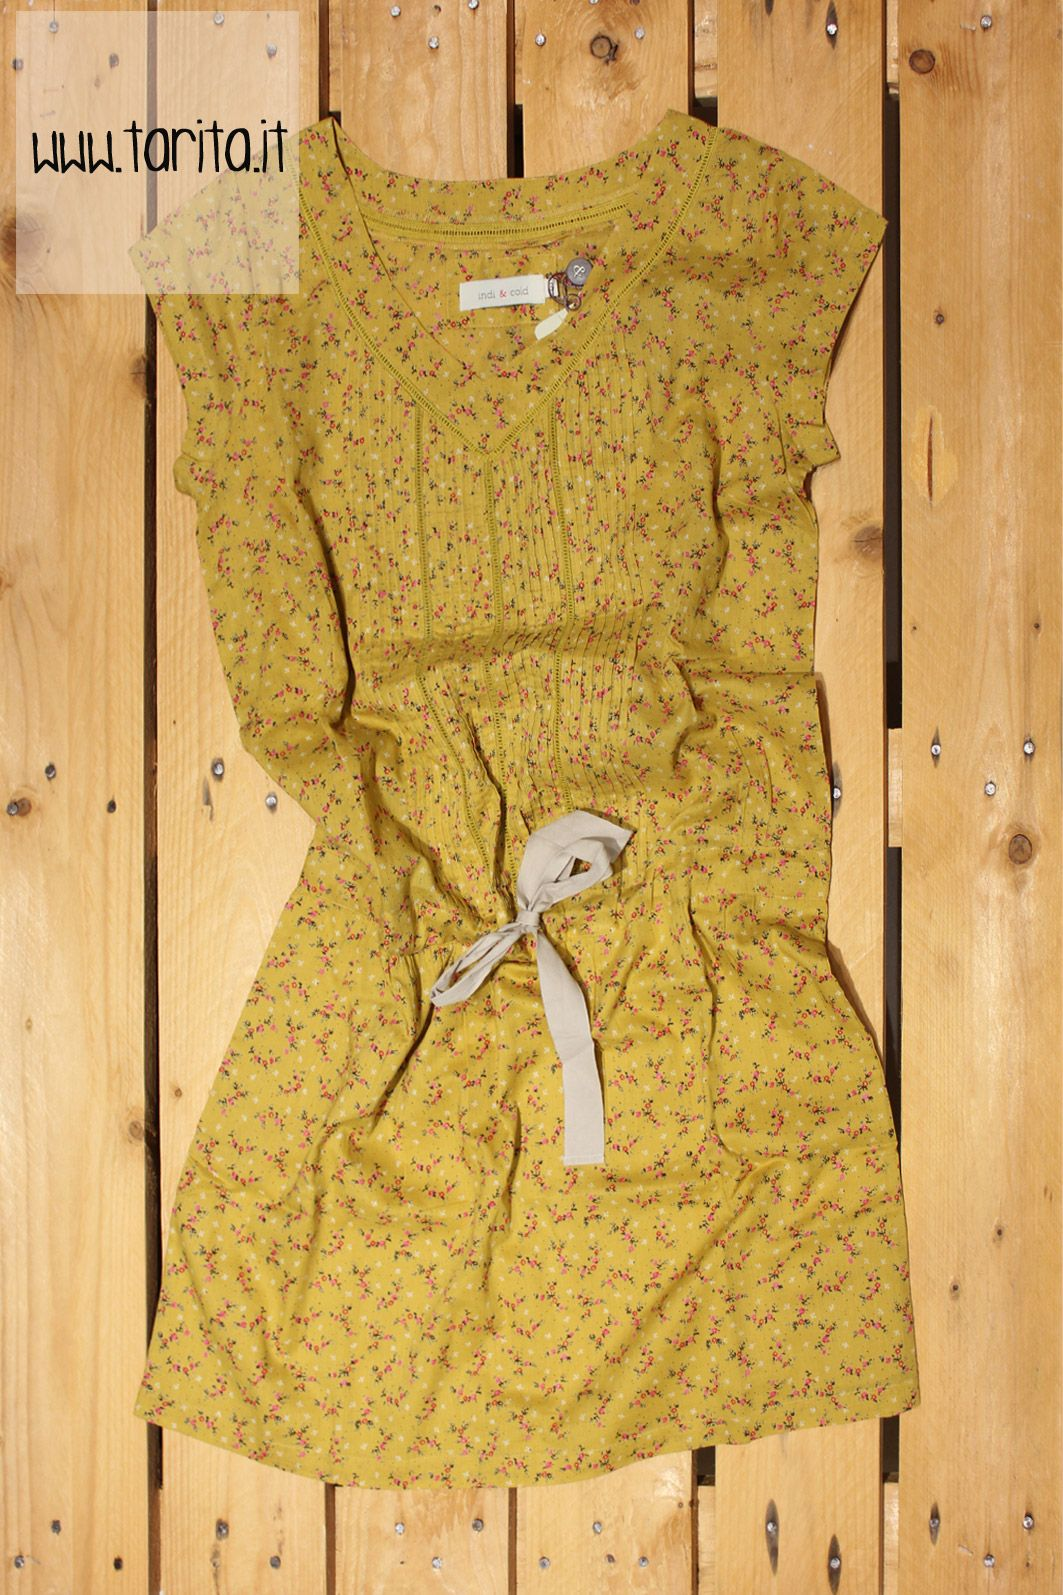 Tarita S/S 2013. Indi & Cold, 100% printed cotton dress.